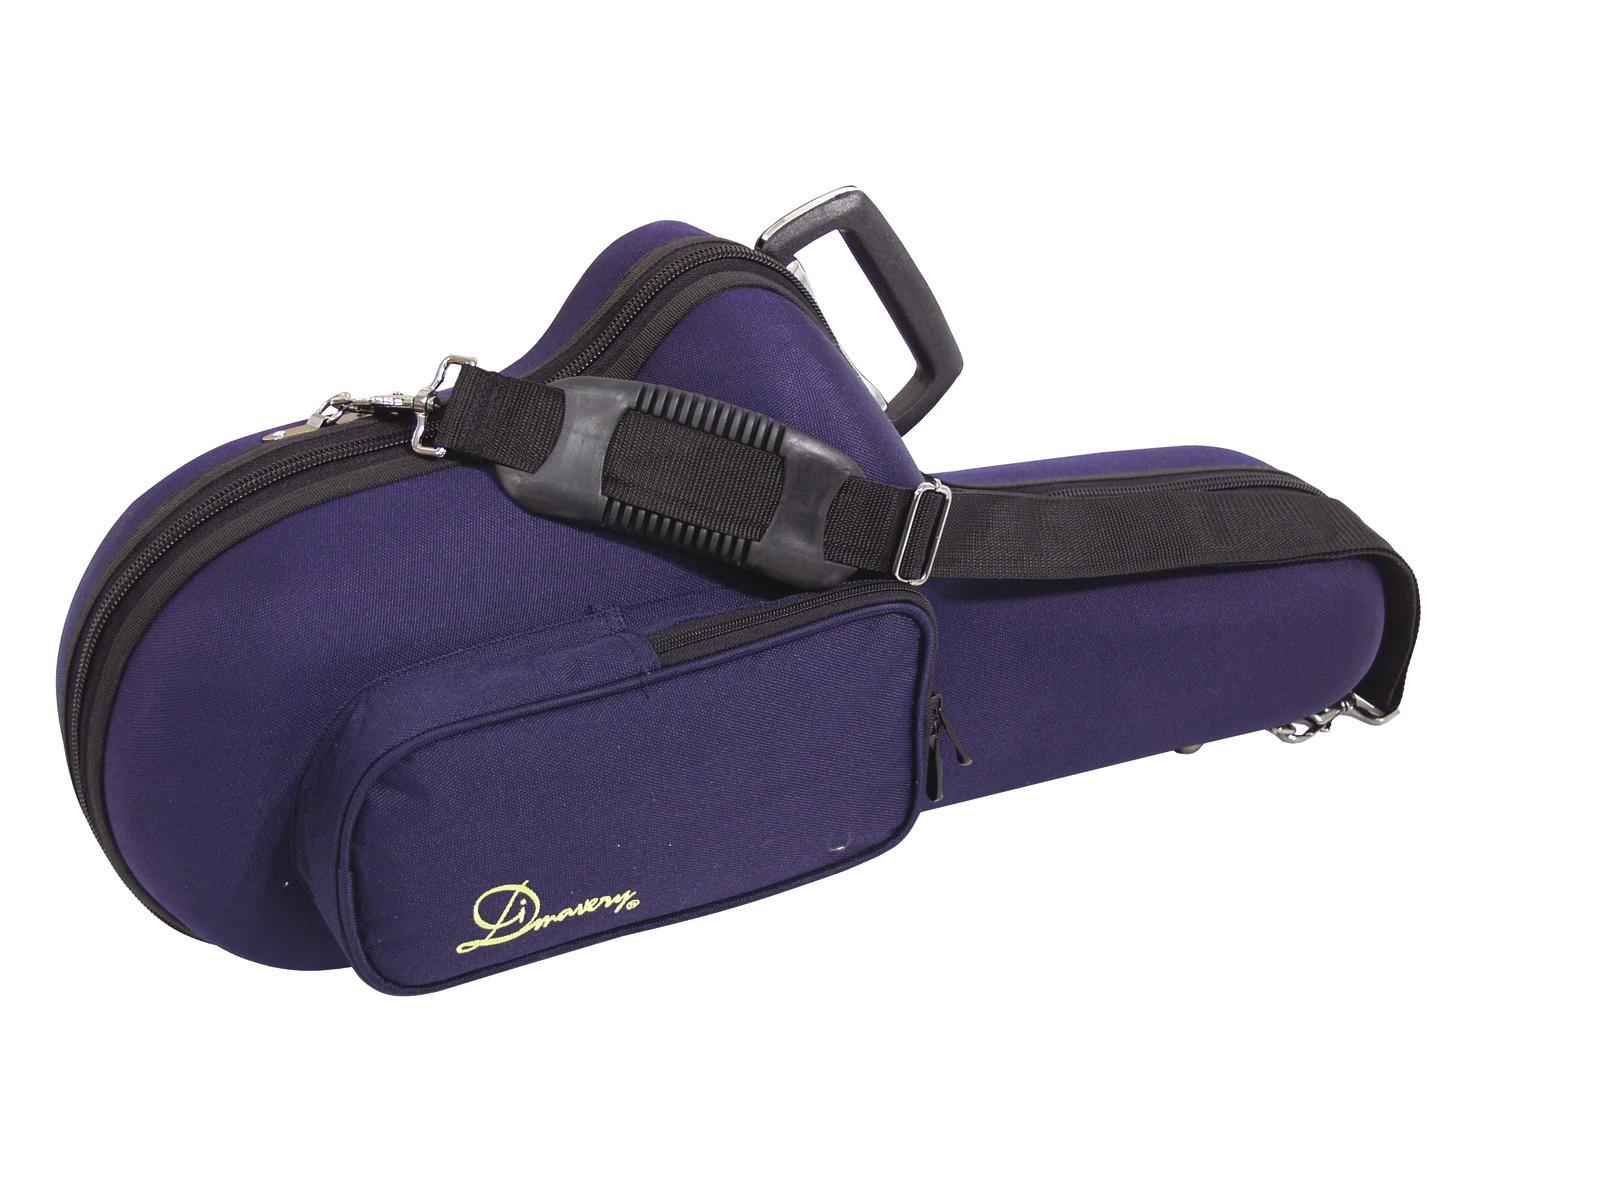 Custodia borsa per sassofono, sax, semirigida blu, DIMAVERY